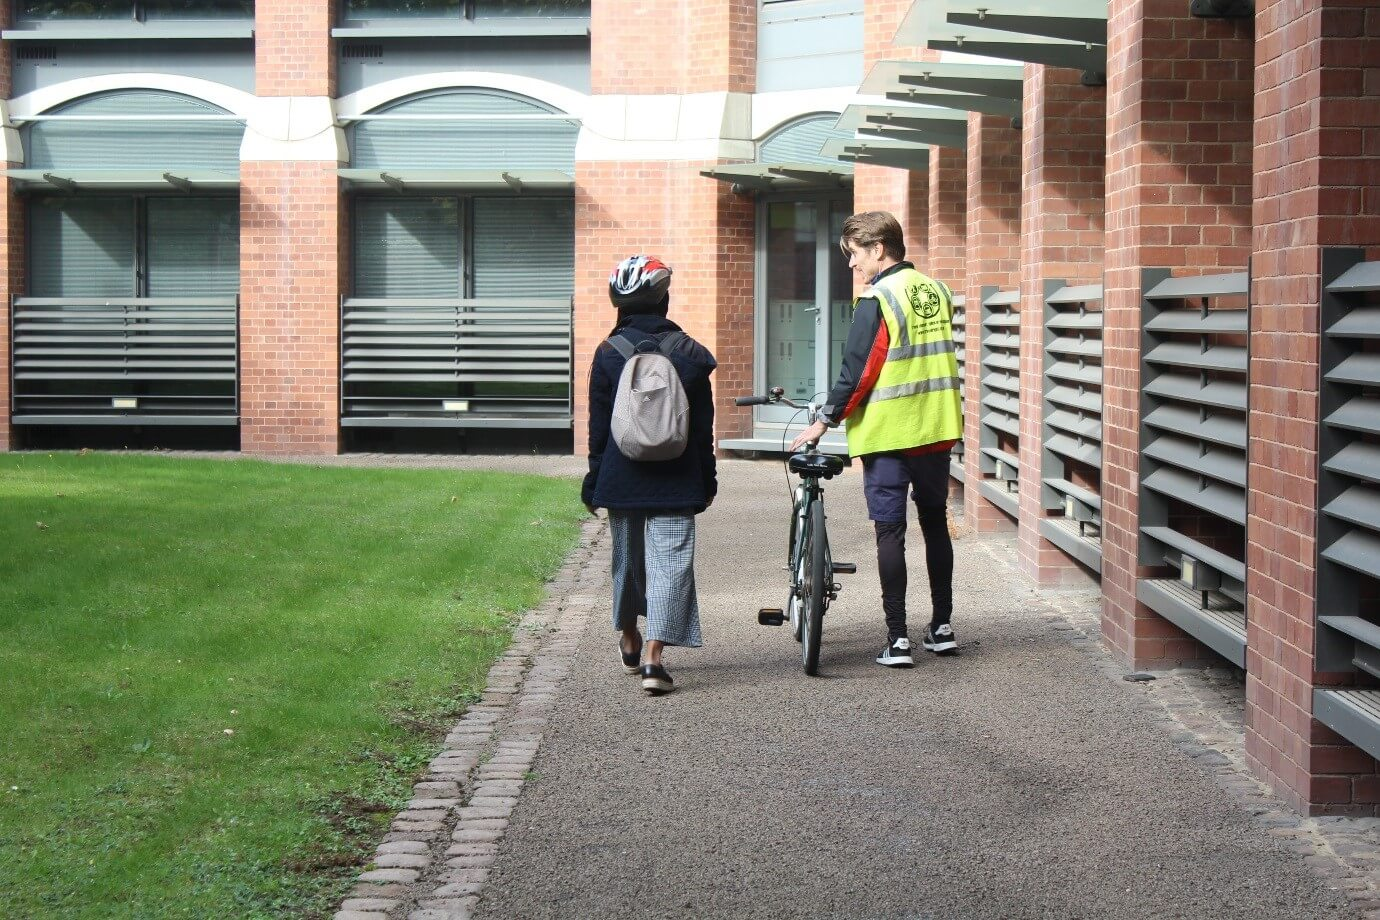 Zoe walking alongside a cycle-buddying mentor and bike